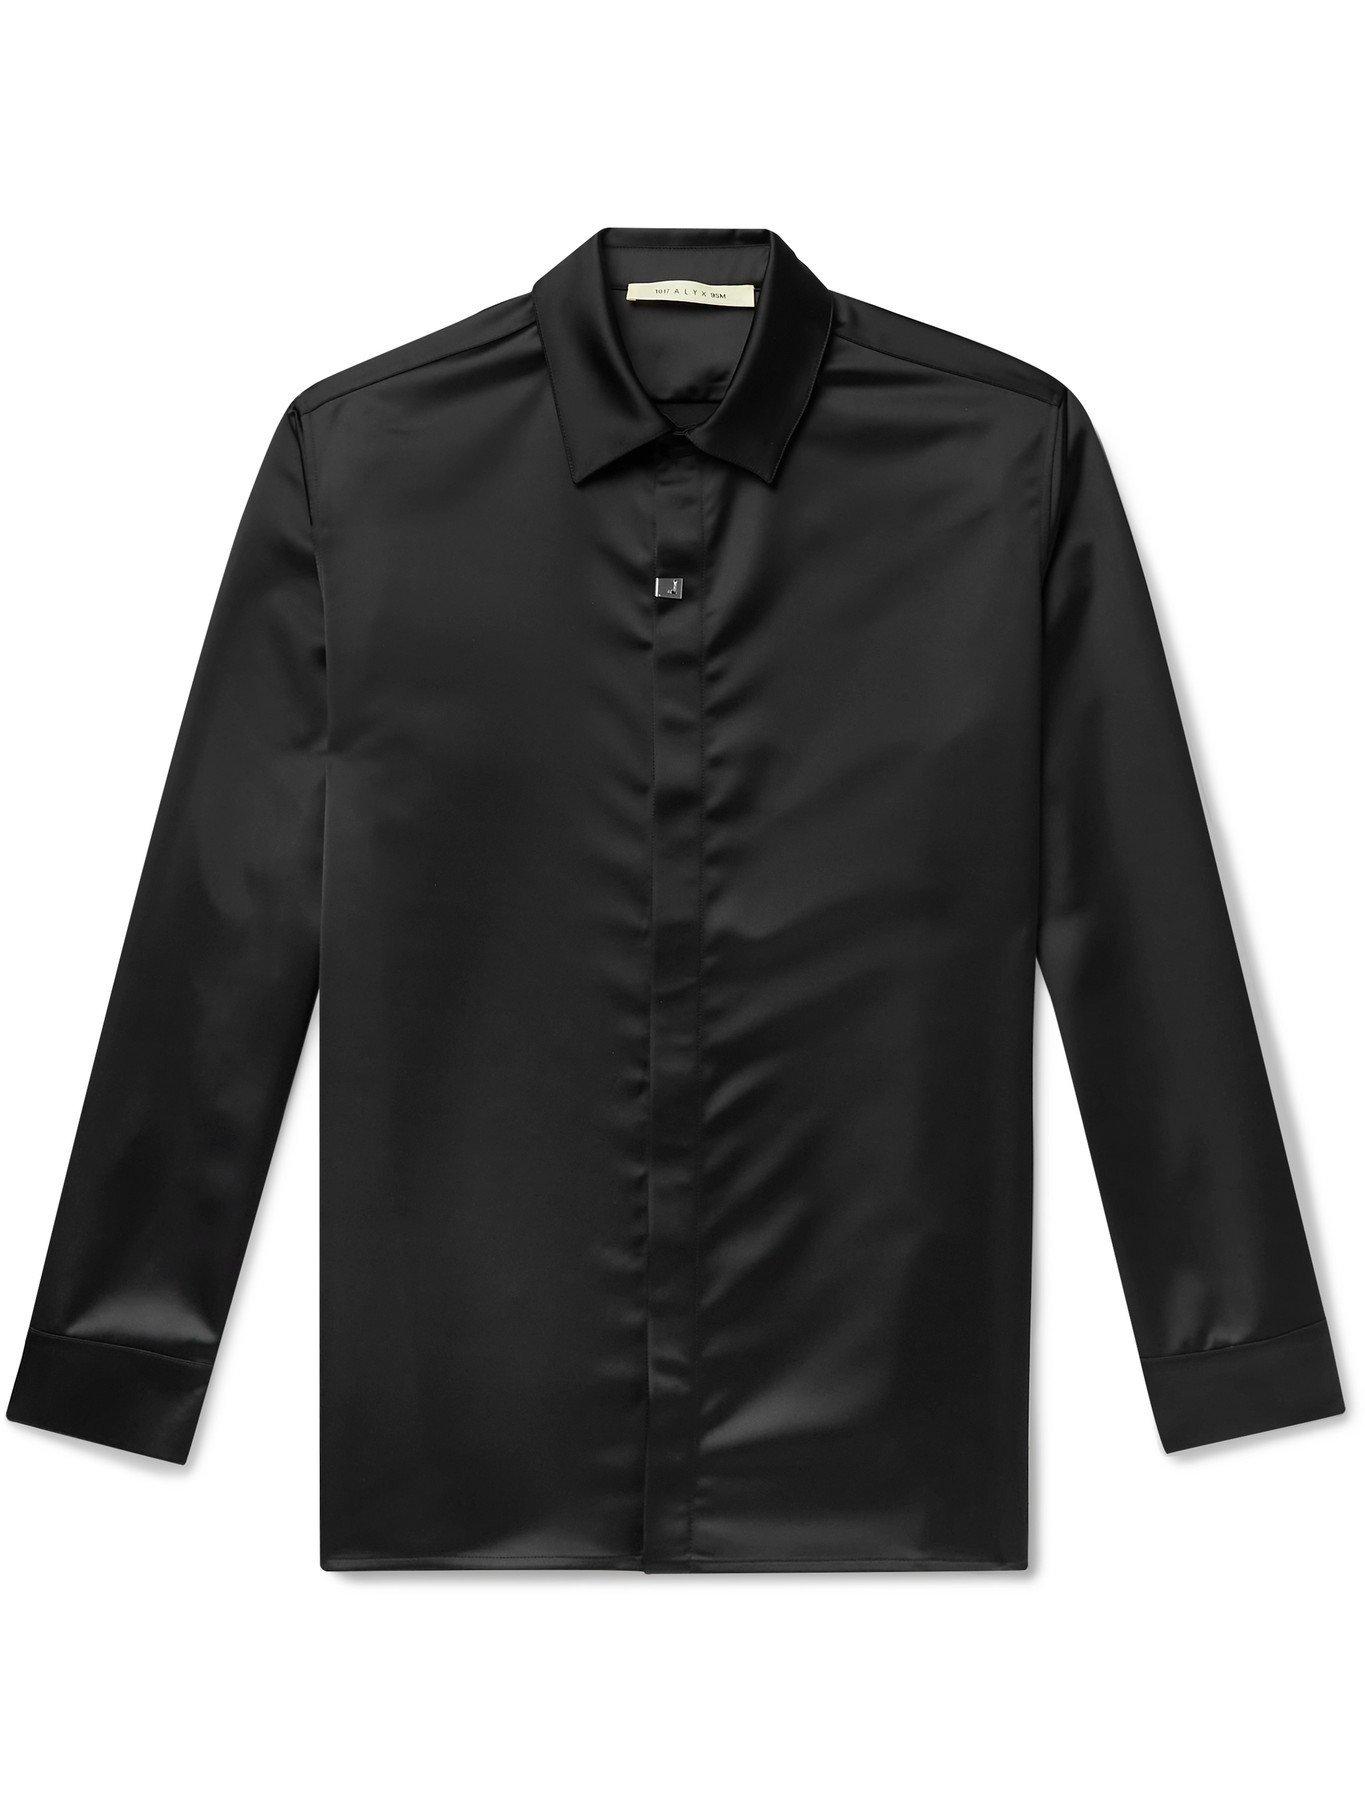 Photo: 1017 ALYX 9SM - Satin Shirt - Black - L